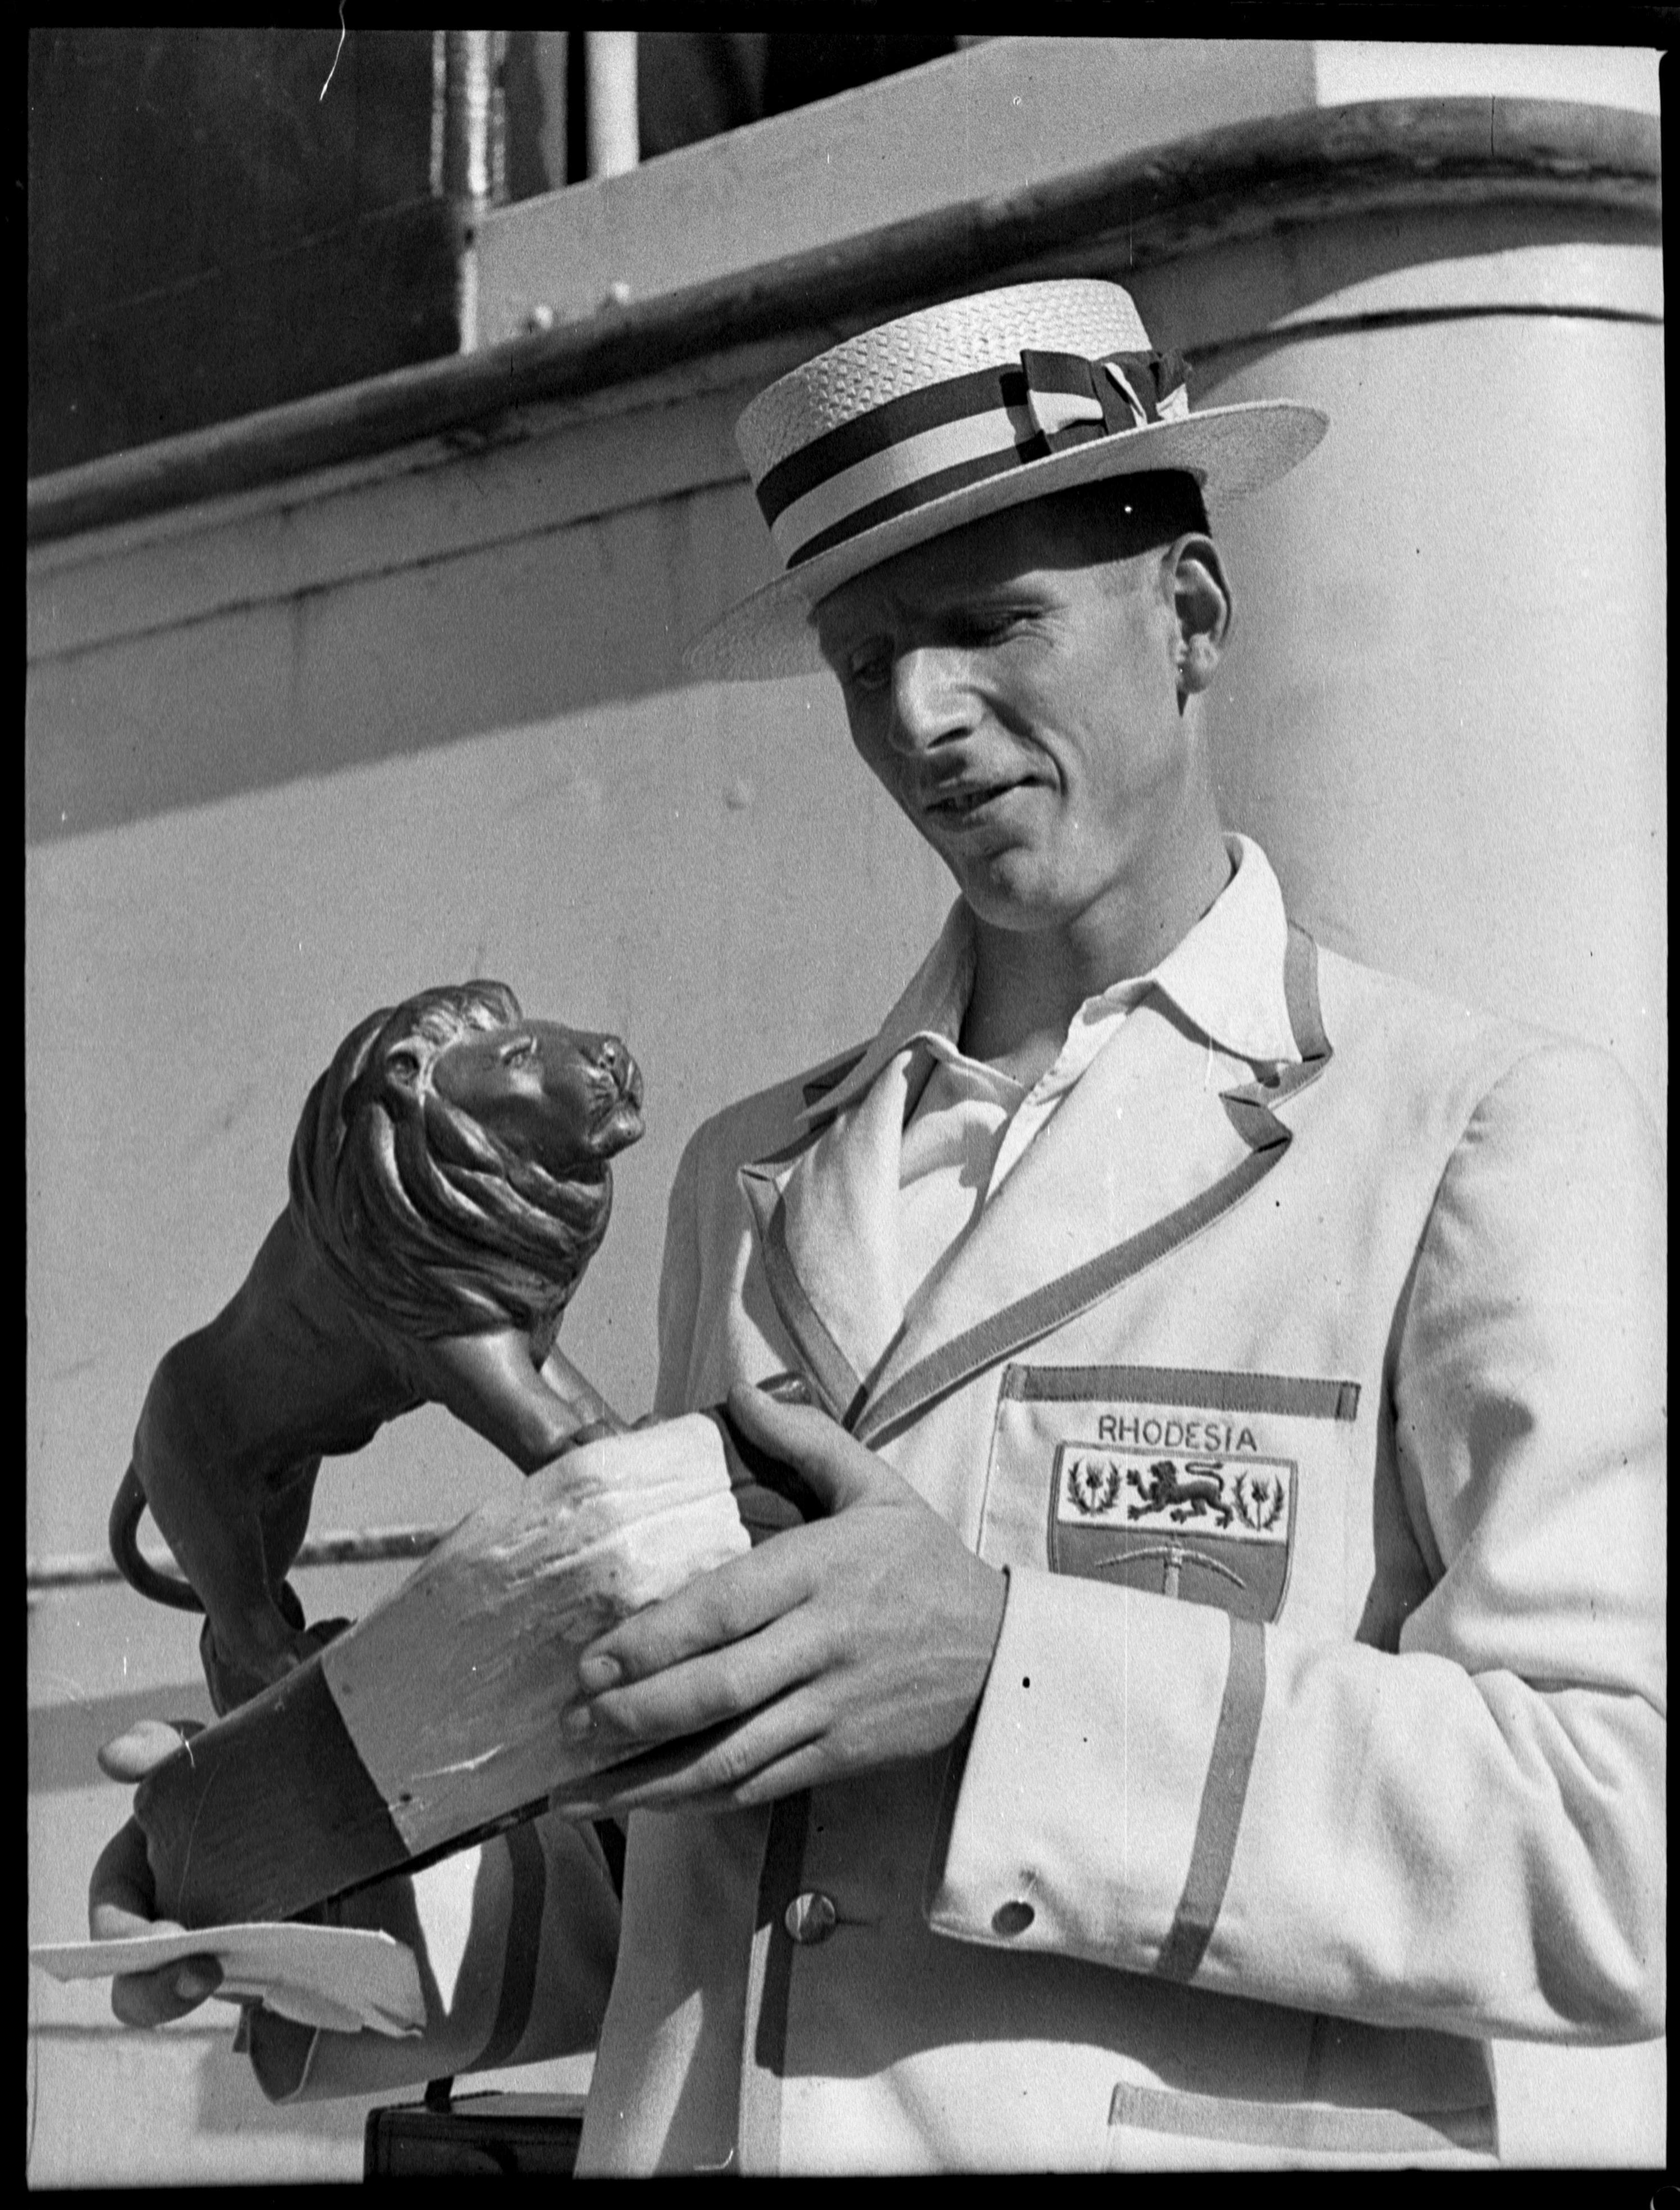 Empire Games Competitor, 1938, Sam Hood